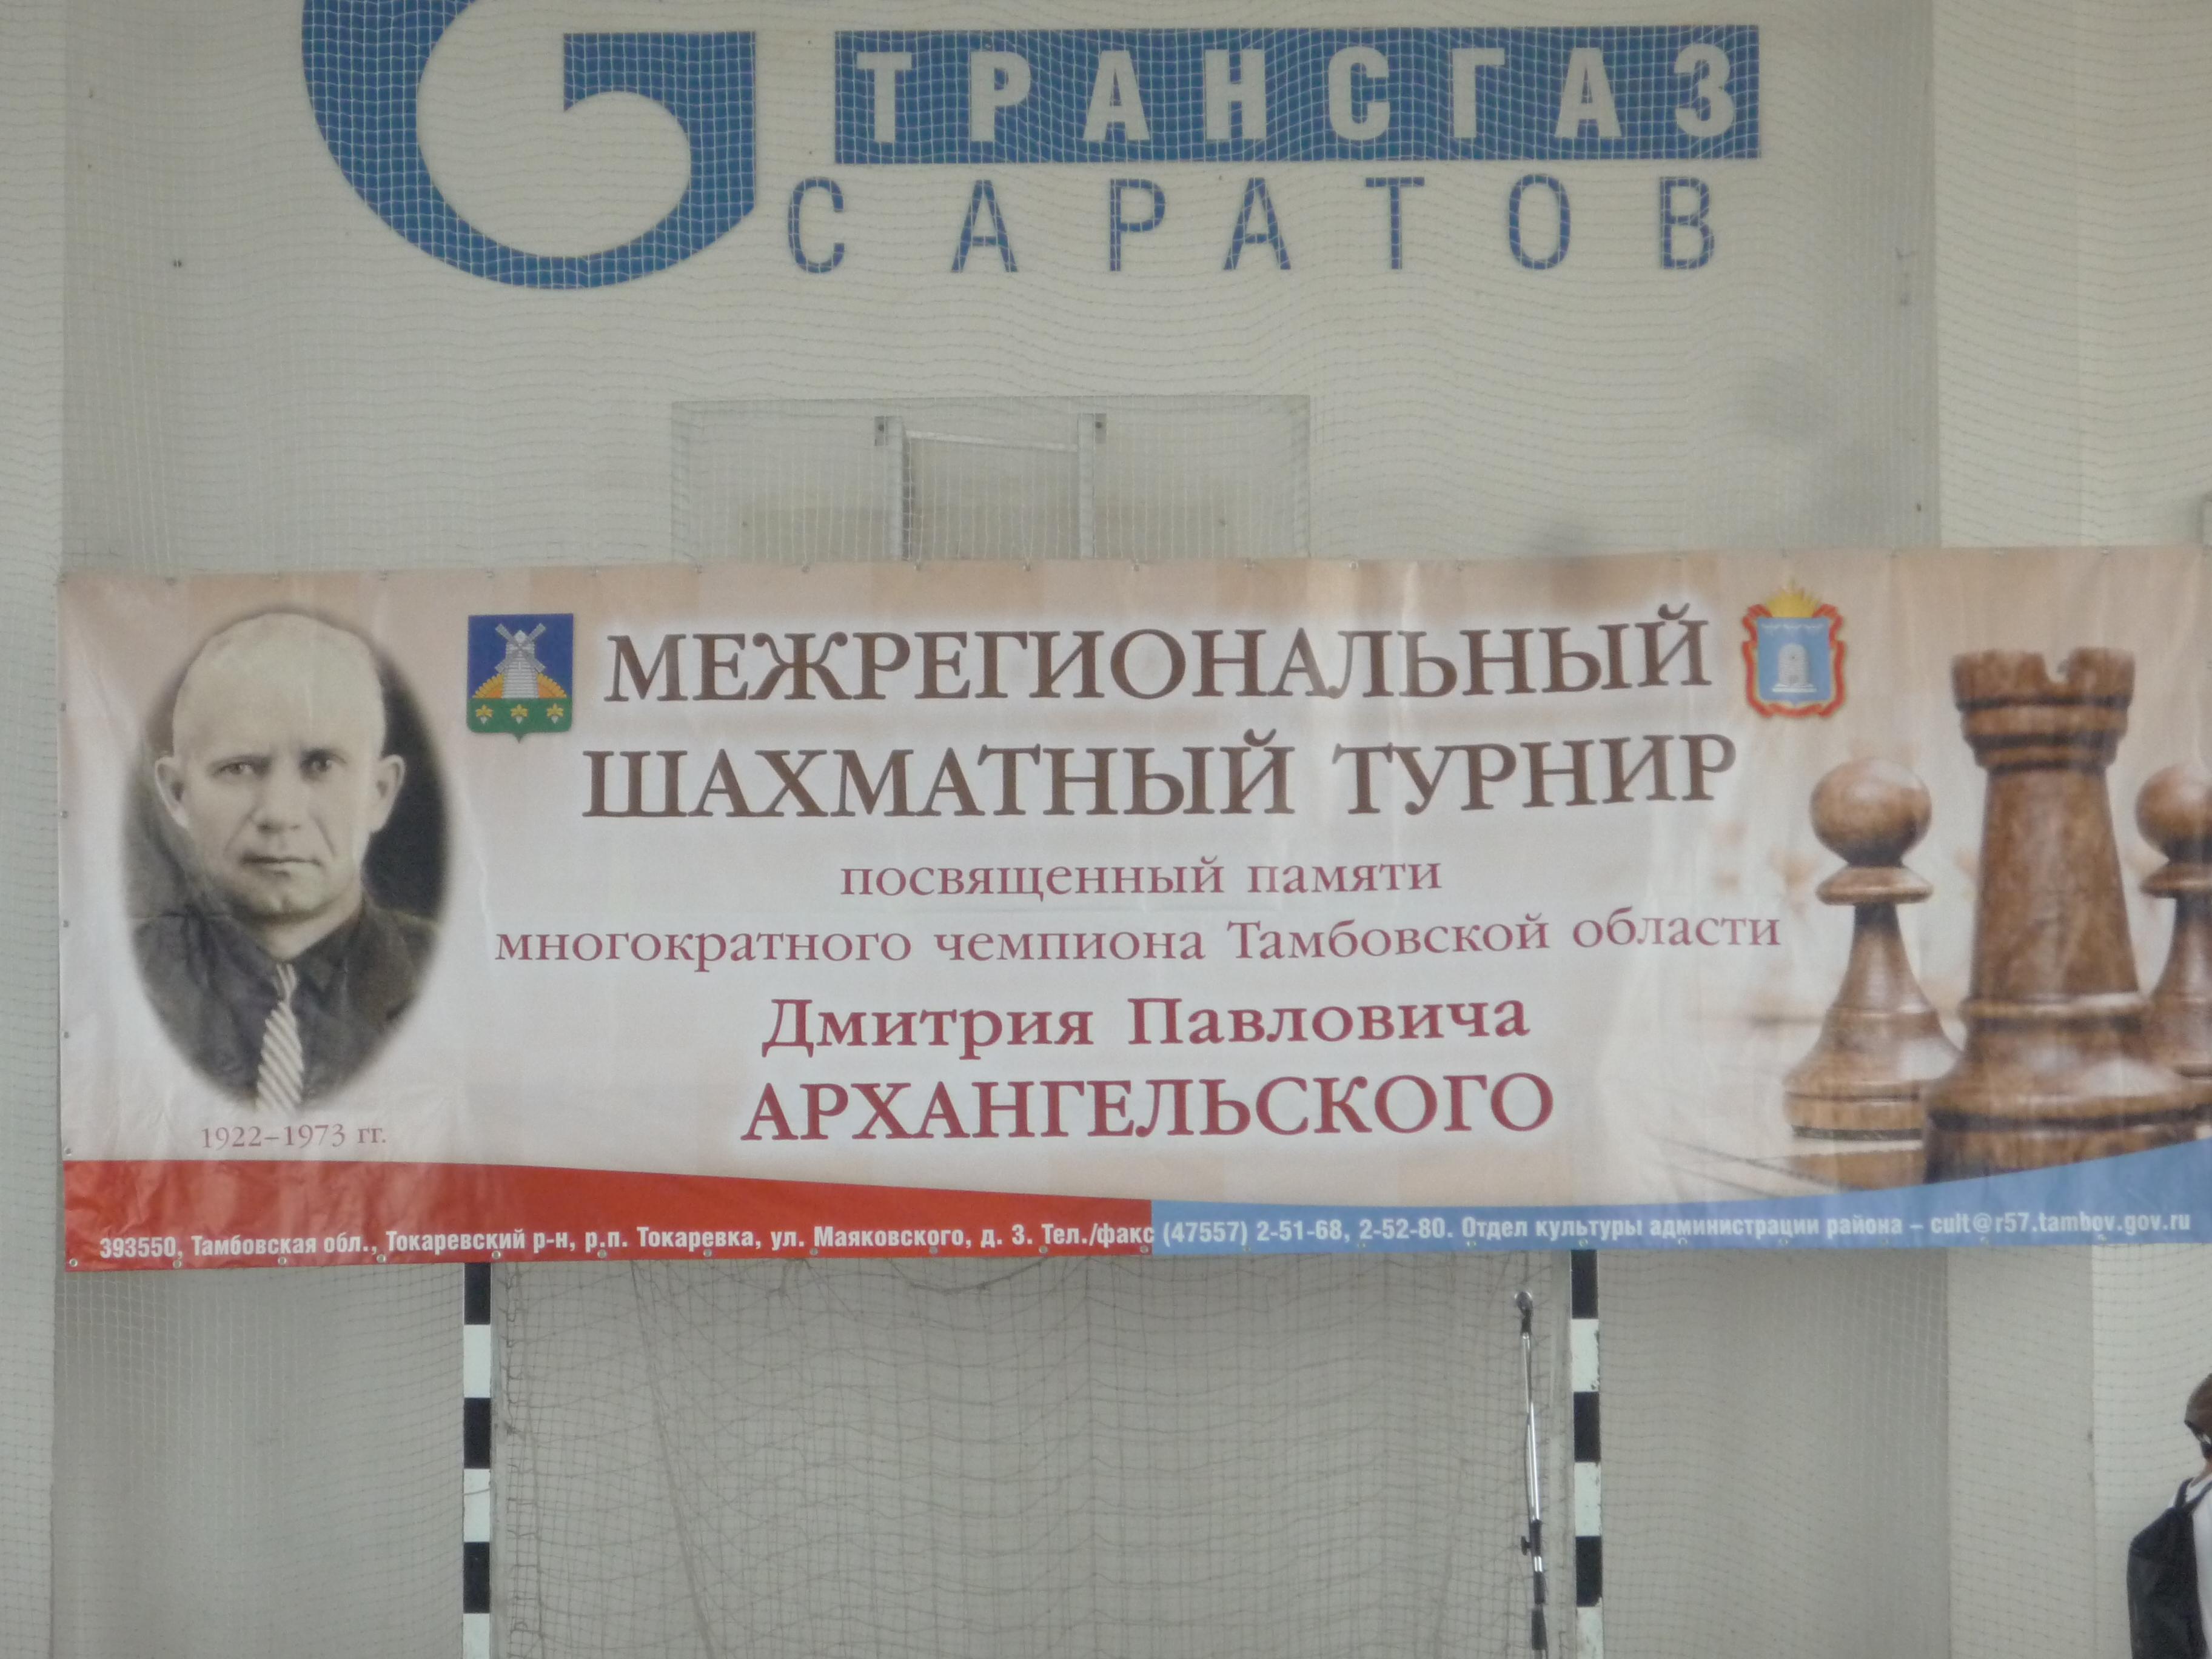 Альбом 18 шахматный турнир памяти Д.П. Архангельского - 04-05 августа 2018 г.